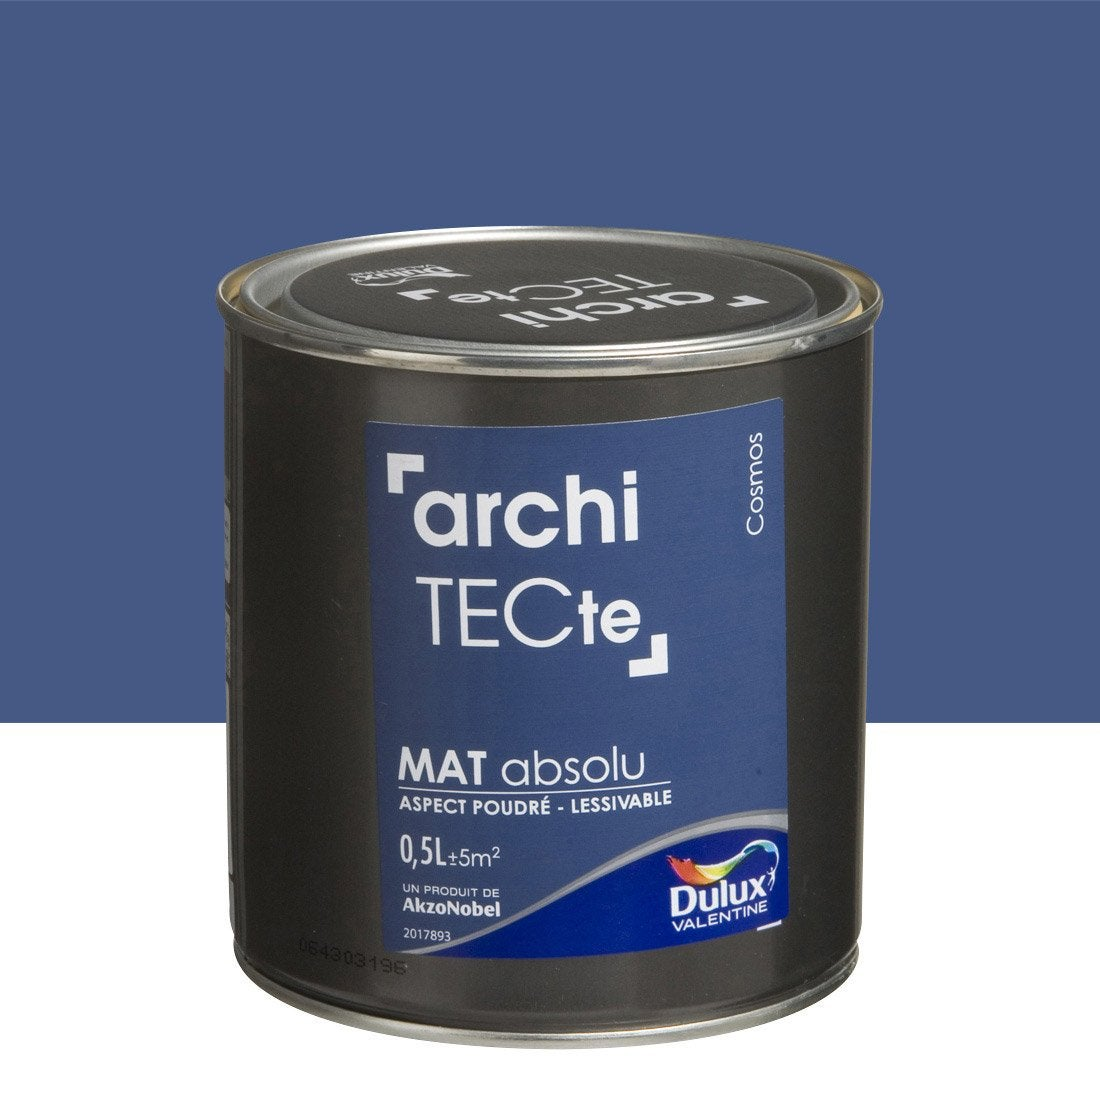 peinture bleu cosmos dulux valentine architecte 0 5 l leroy merlin. Black Bedroom Furniture Sets. Home Design Ideas